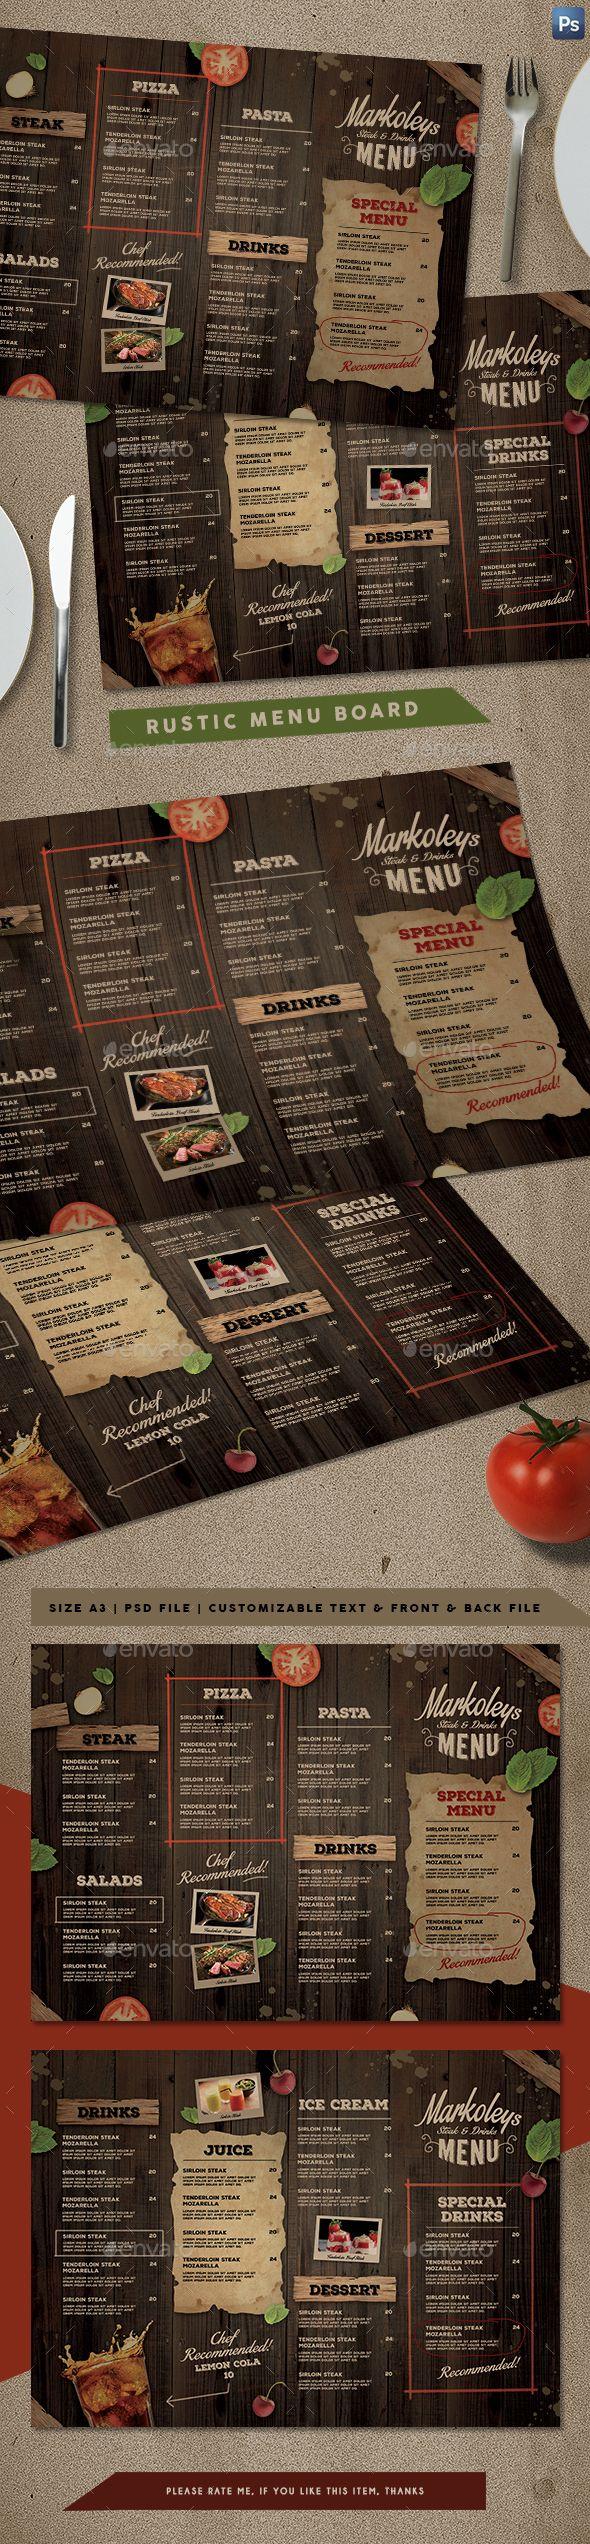 Rustic Cafe Menu Board — Photoshop PSD #food menu #menu design • Download ➝ https://graphicriver.net/item/rustic-cafe-menu-board/20349425?ref=pxcr